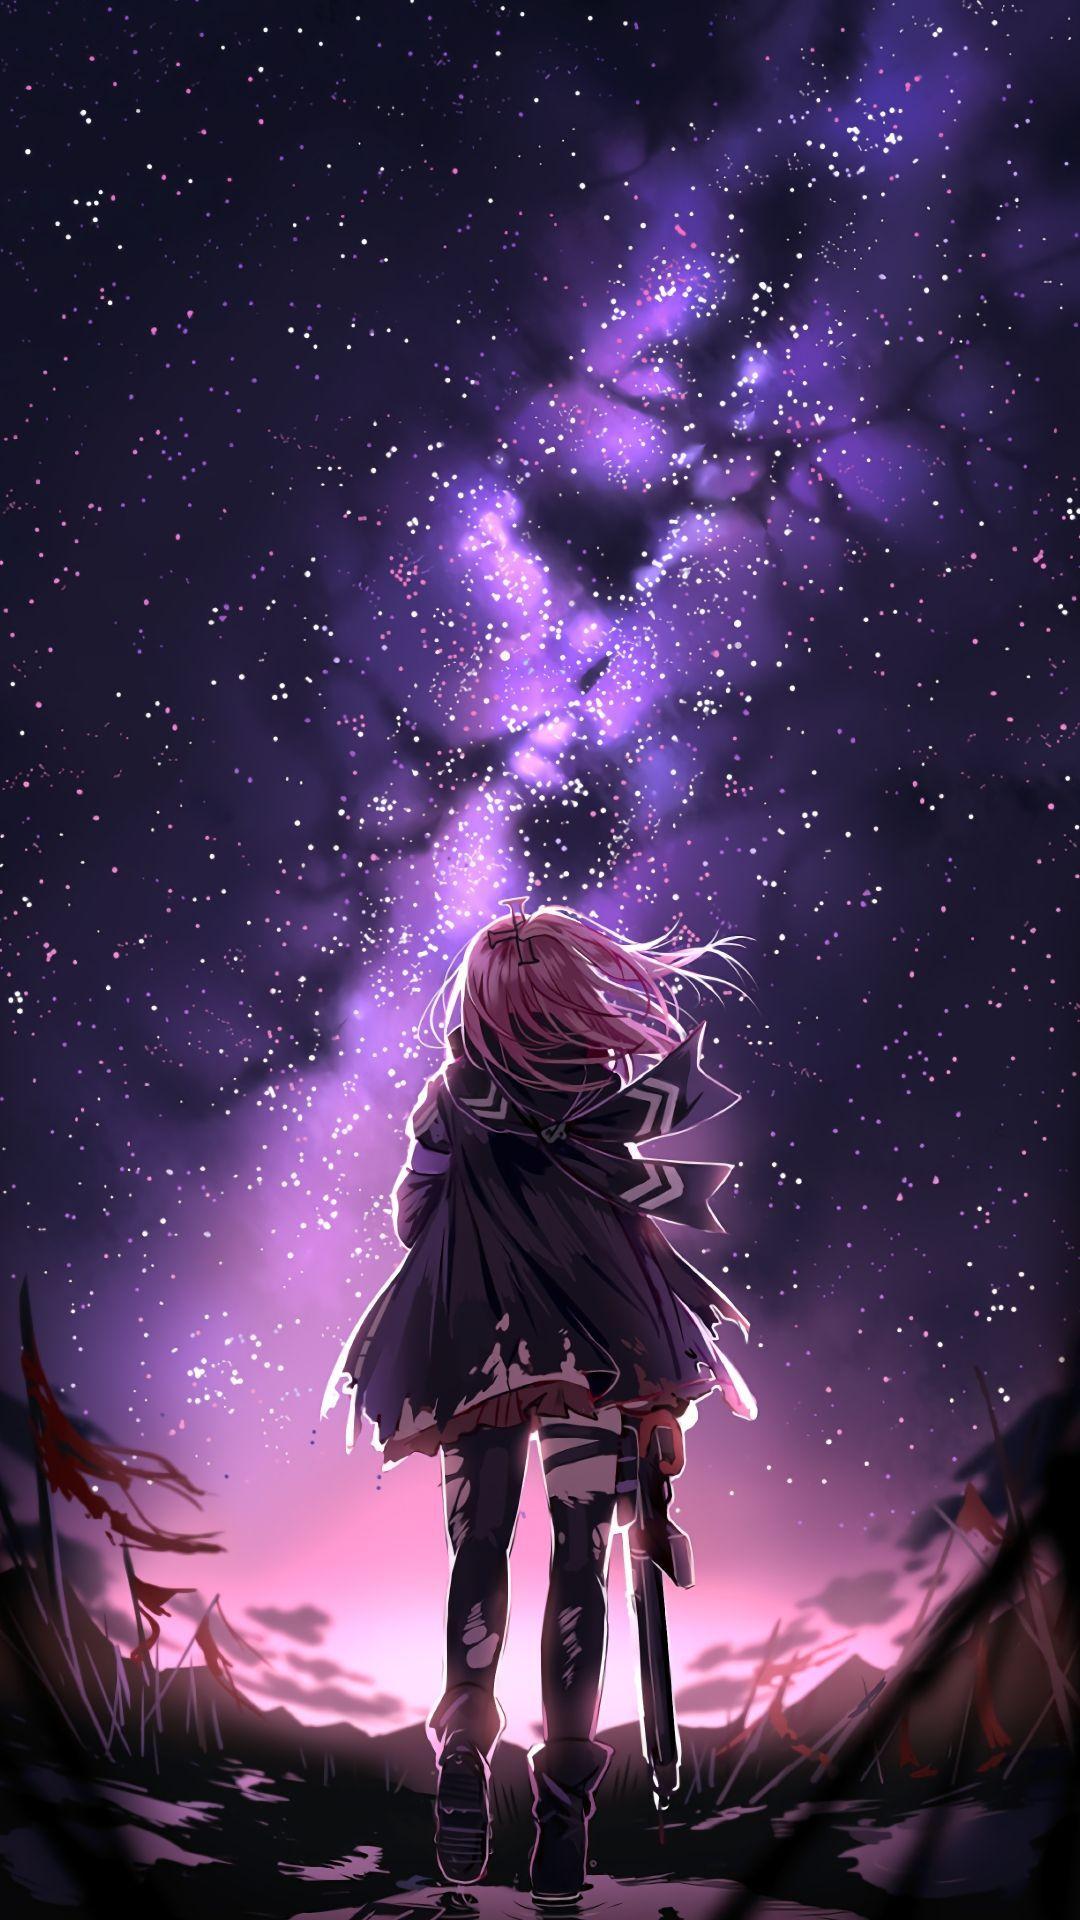 Kawaii Anime Hd Galaxy Wallpapers Wallpaper Cave